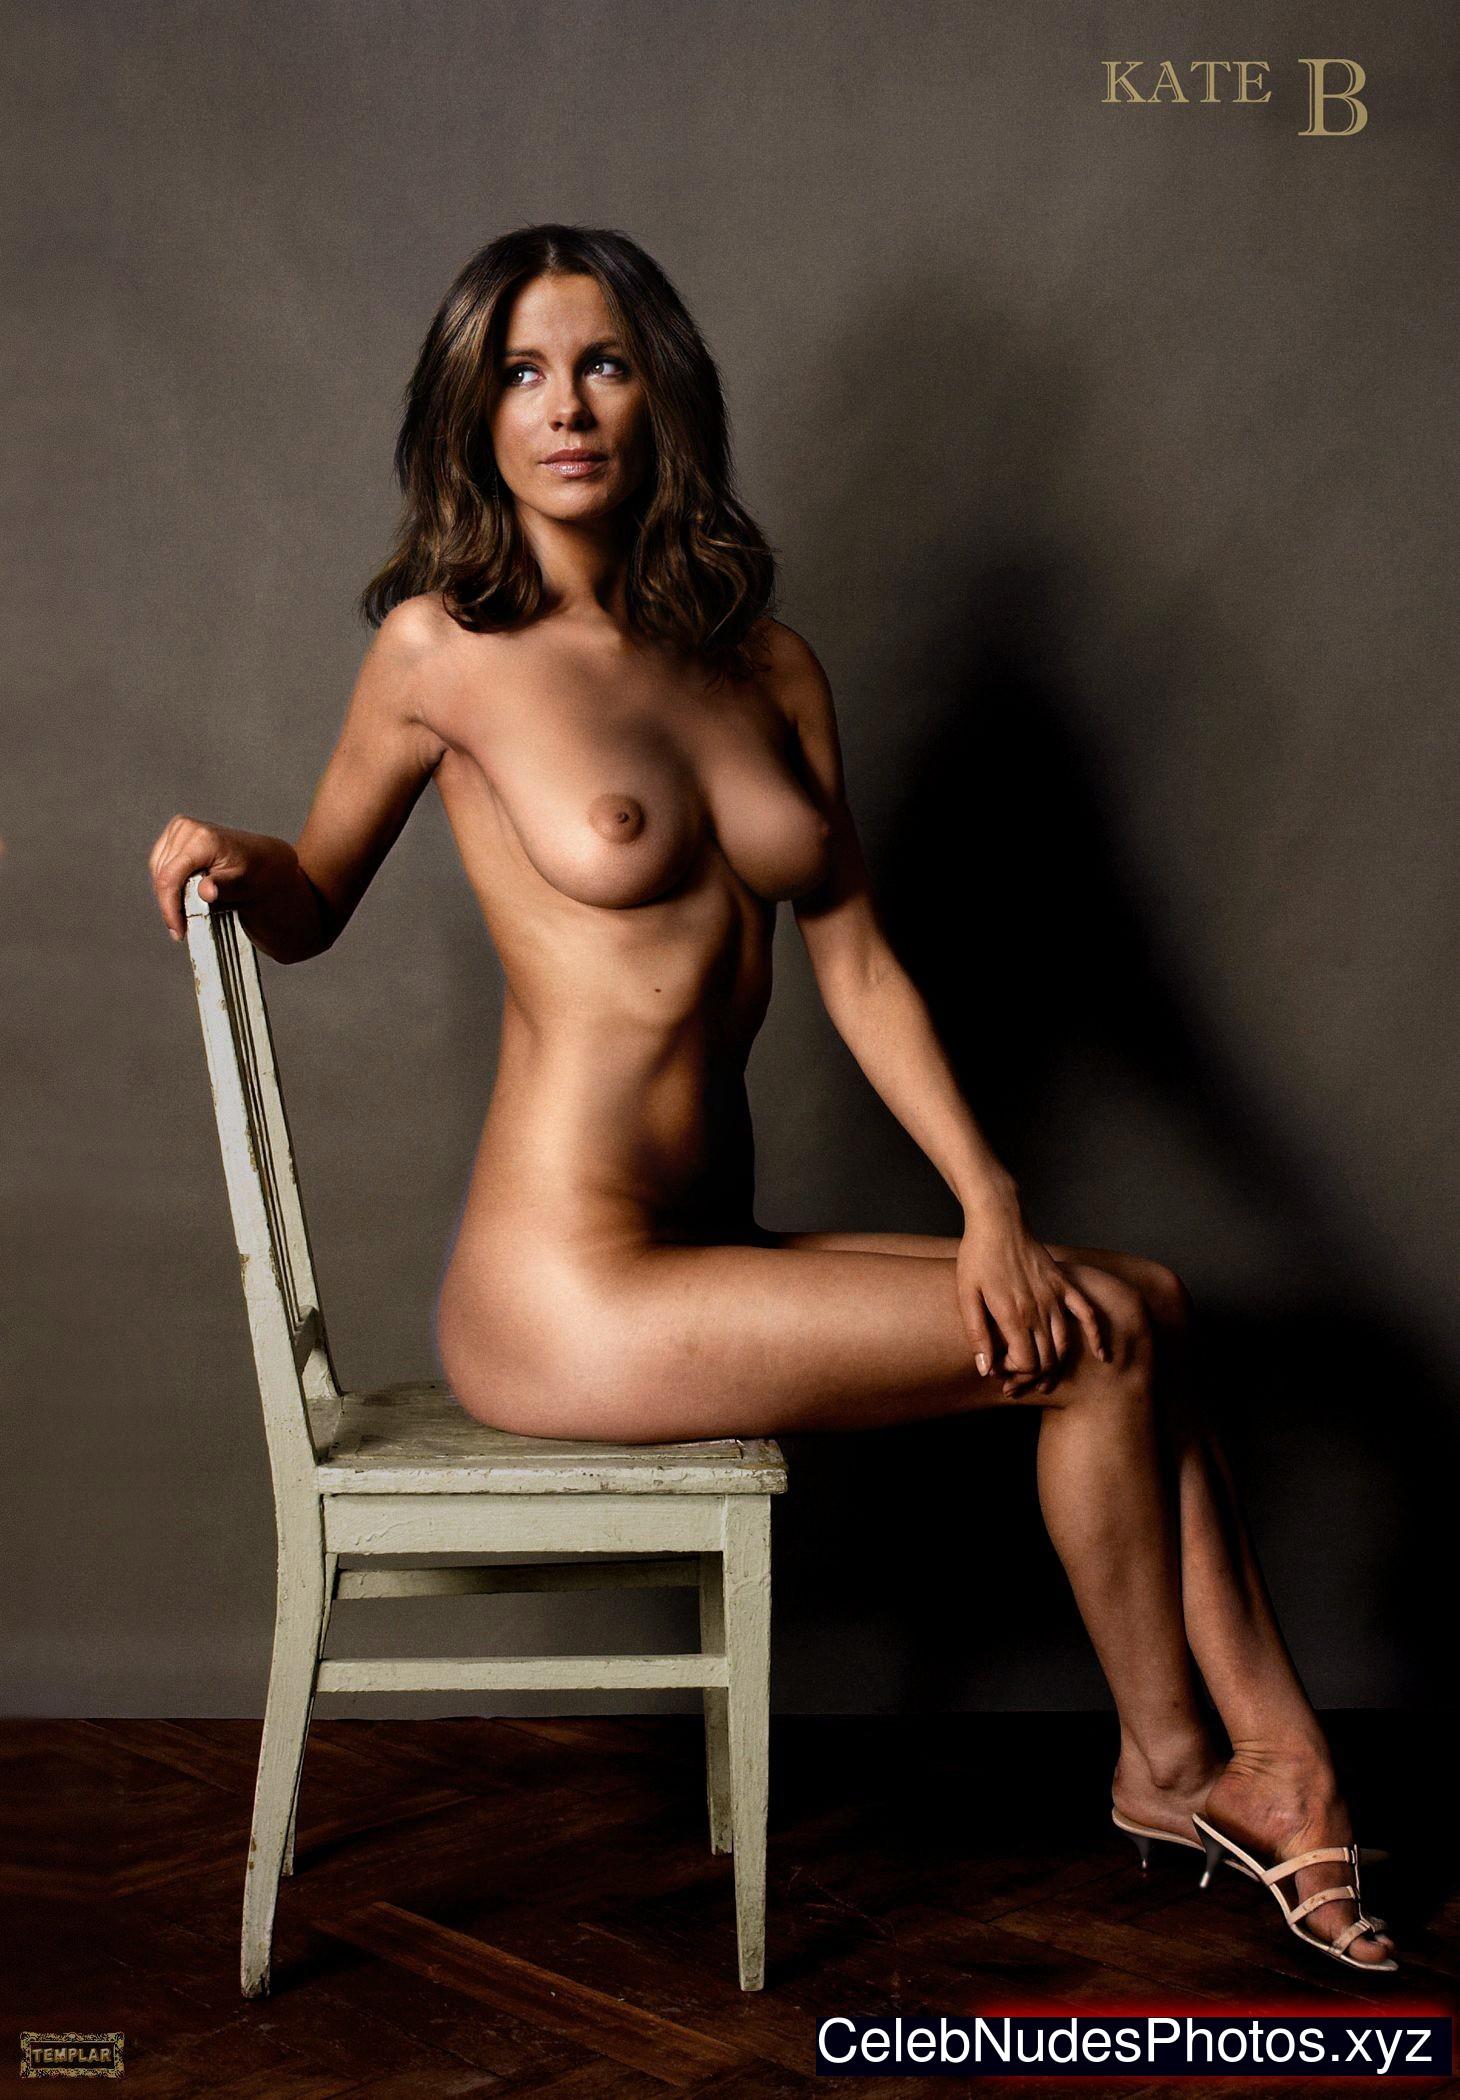 kate beckinsale playboy nude